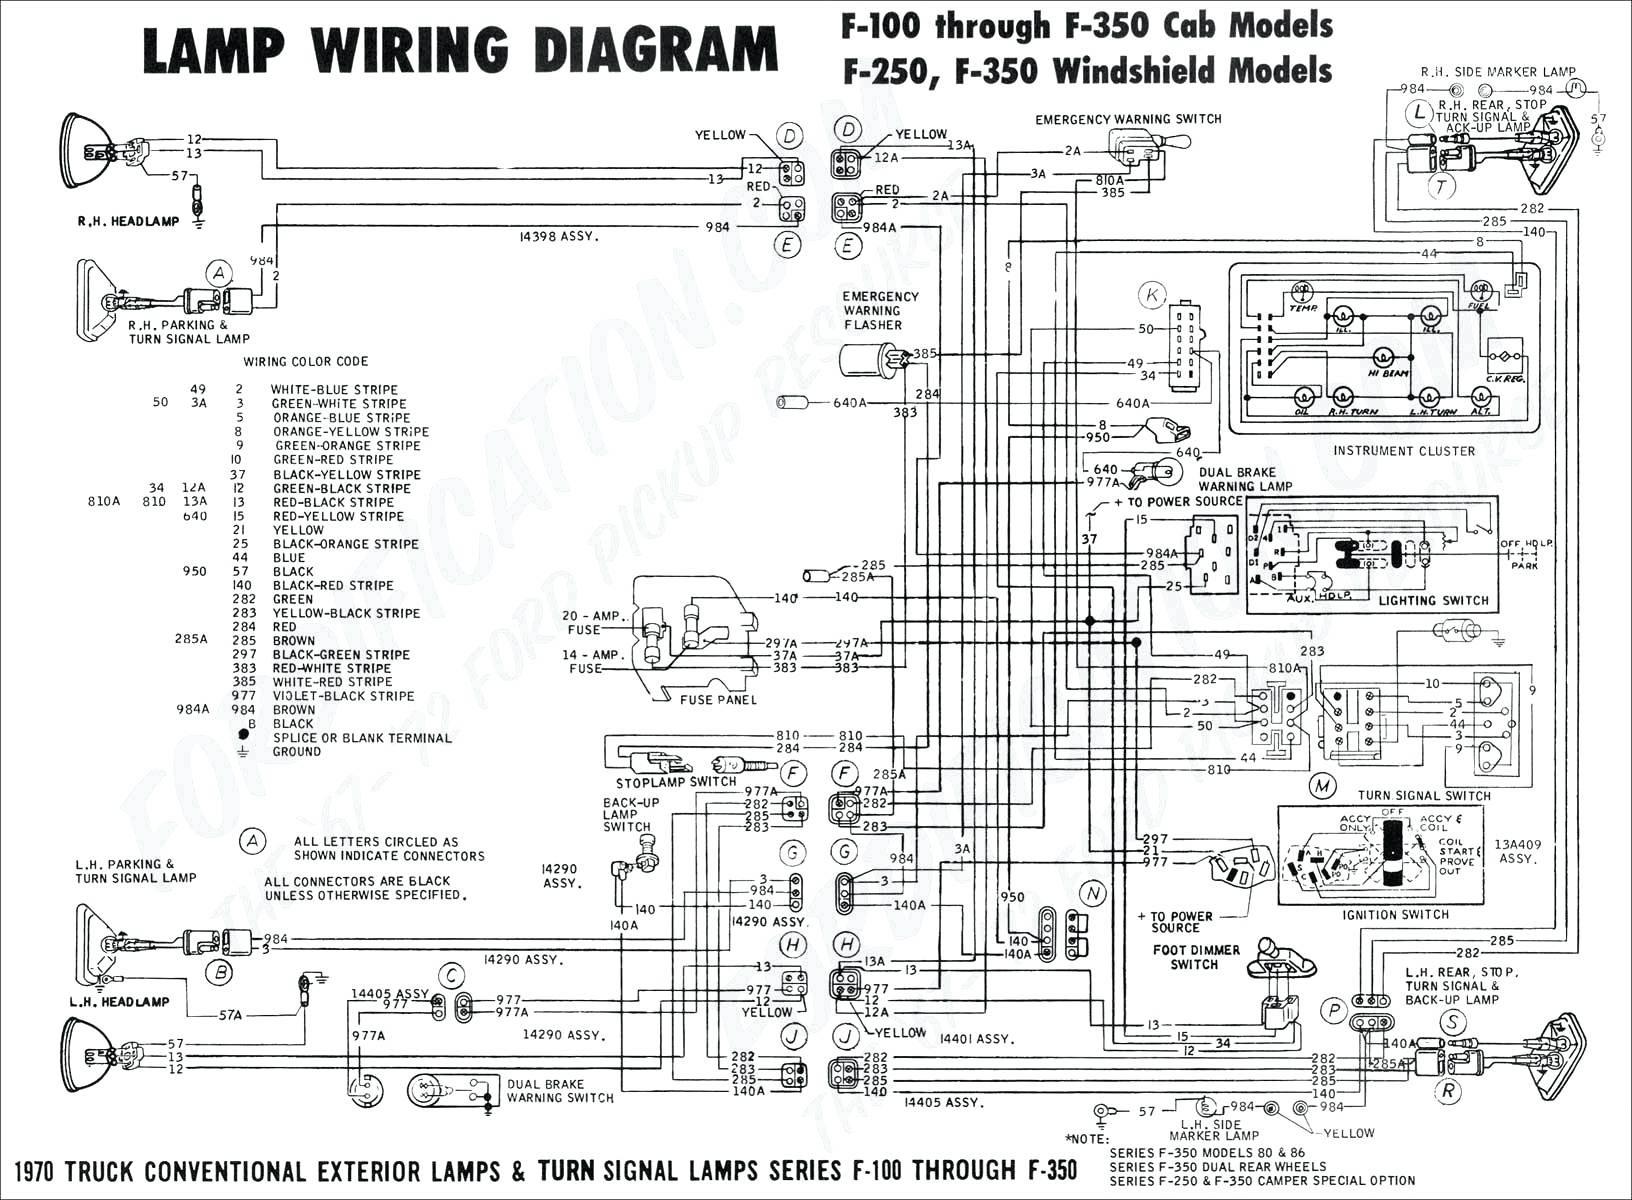 heartland rv wiring diagram Collection-Heartland Rv Wiring Diagram Heartland Rv Wiring Diagram Awesome Wiring Diagram Rv Wiringrams Heartland Trailerram 7-p